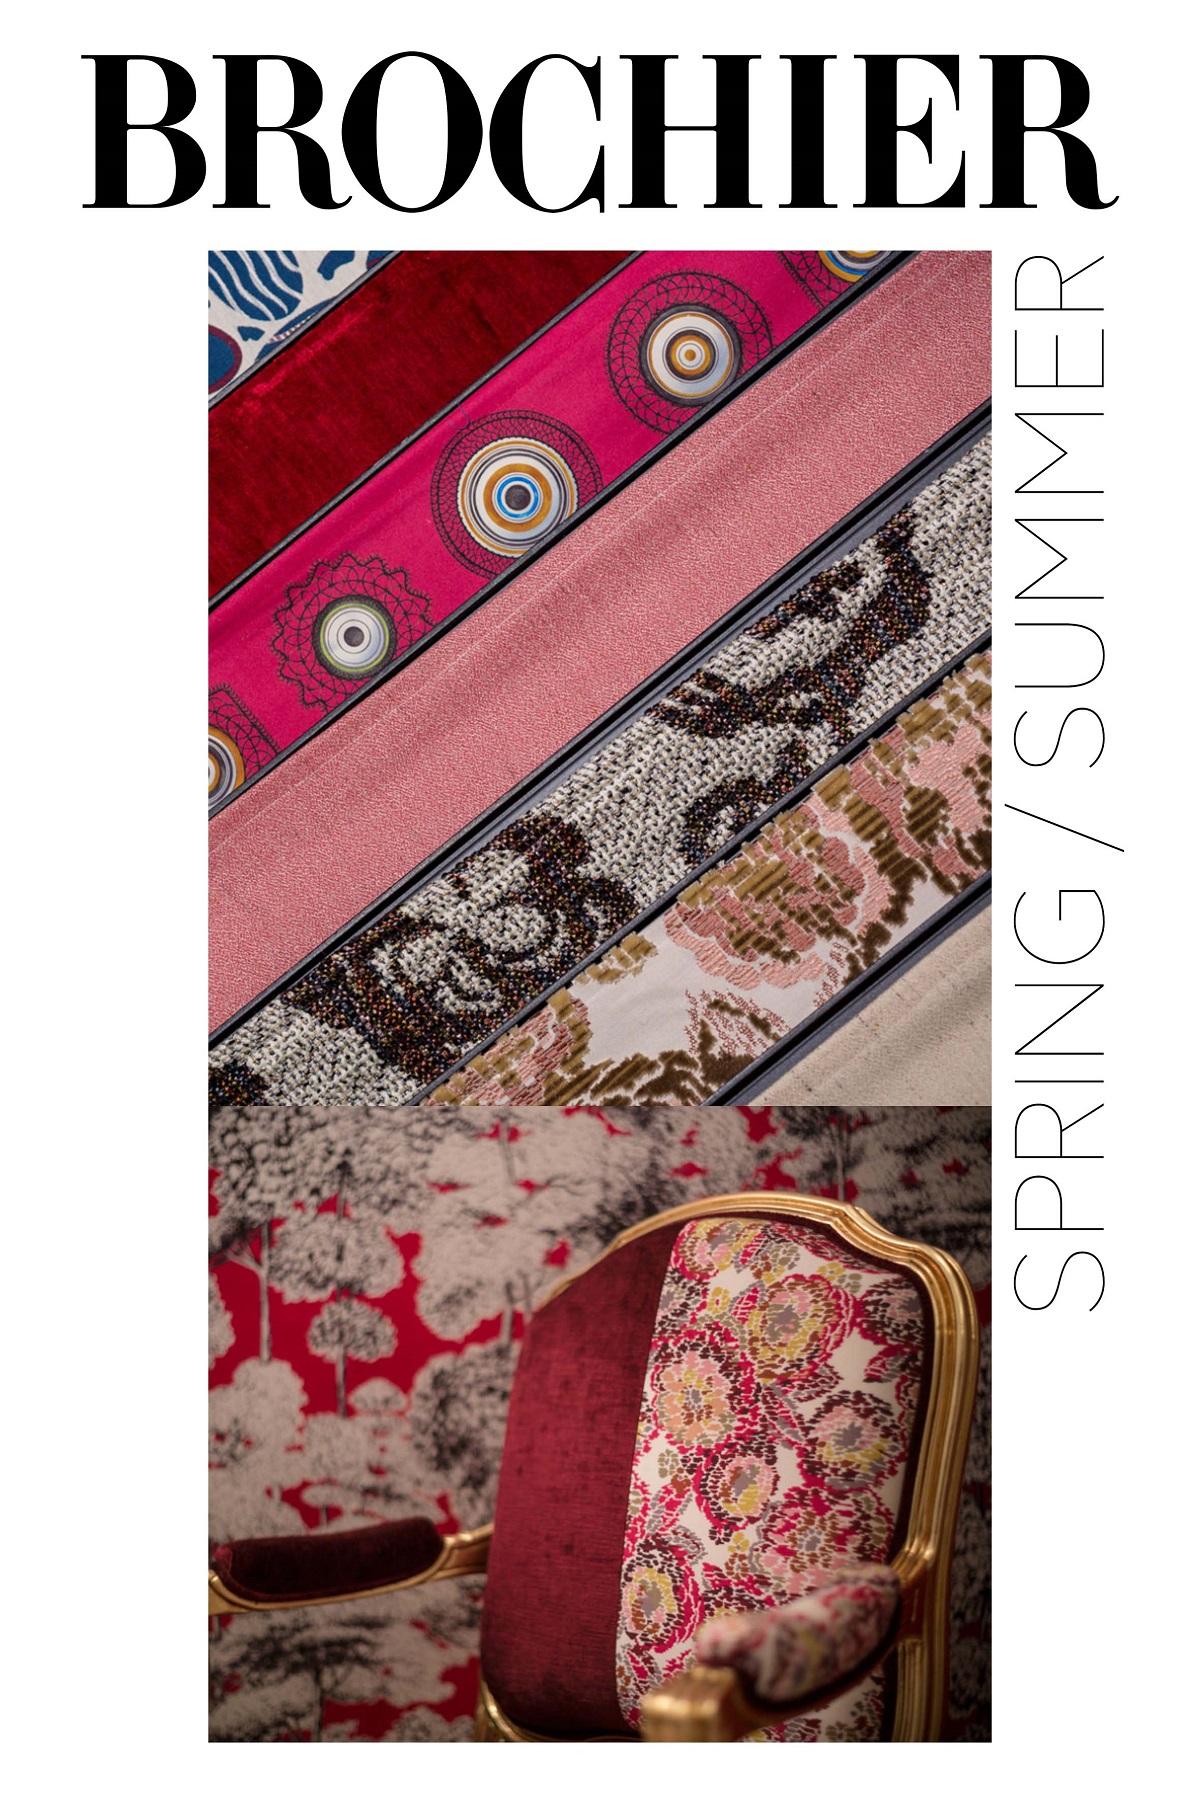 BROCHIER-Outdoor Fabrics-2018-CRIPE-c